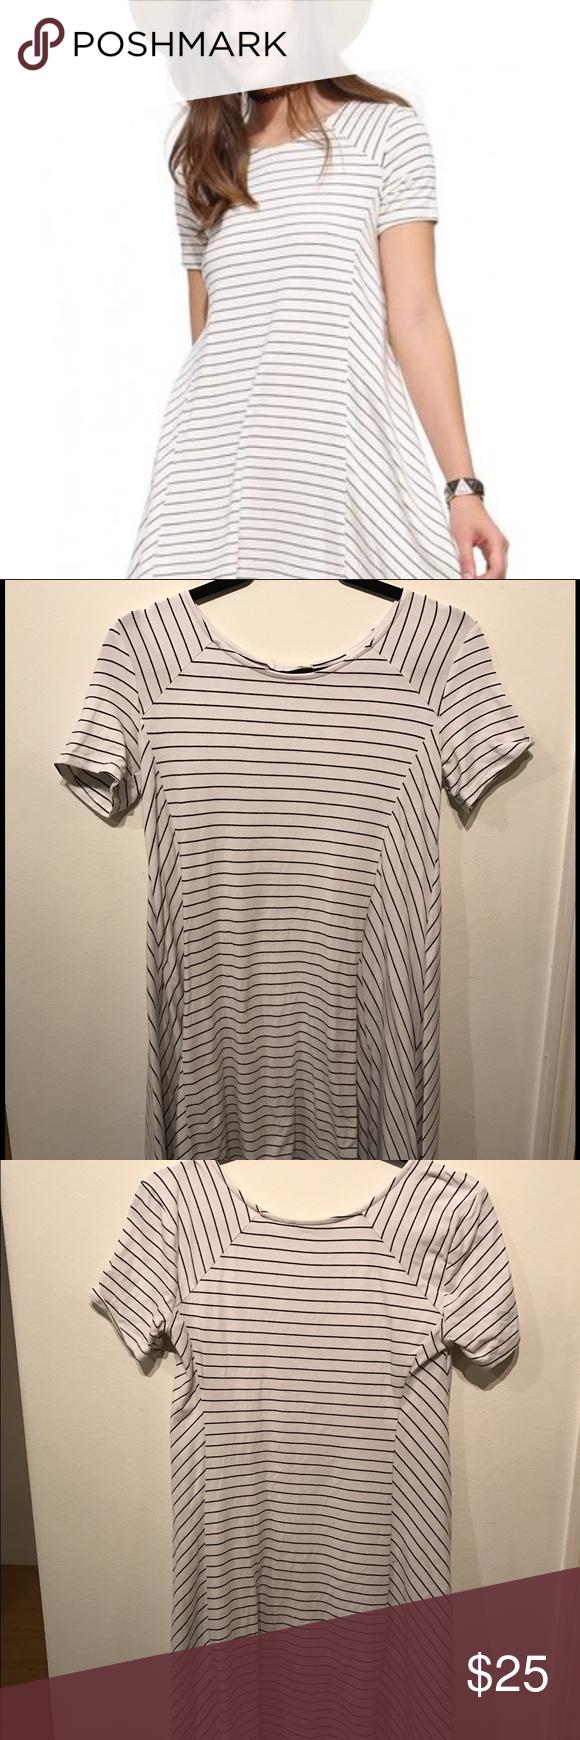 Lush White With Black Stripes Dress My Posh Picks Striped Dress